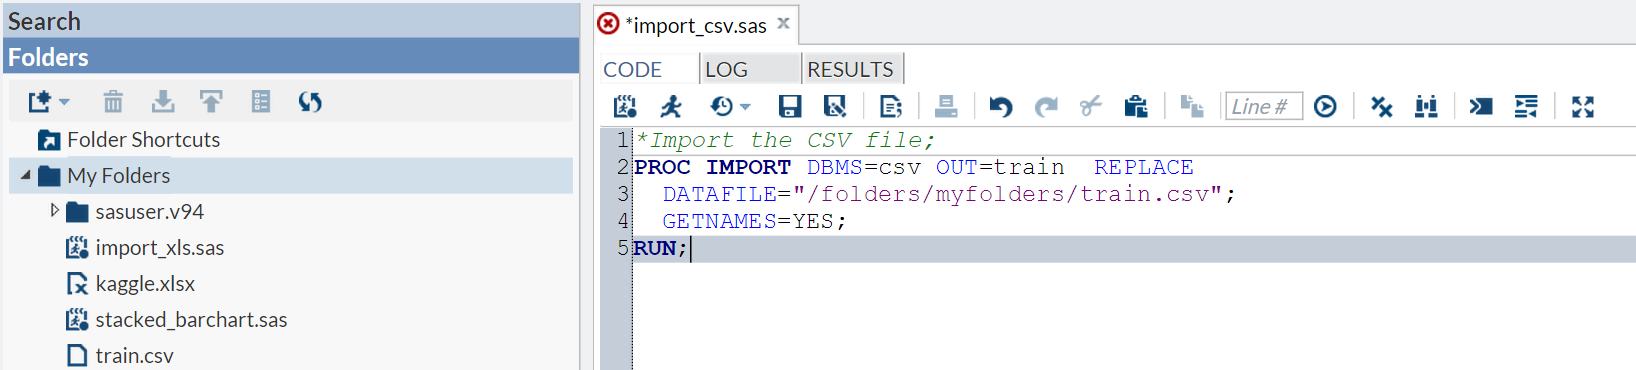 import_csv